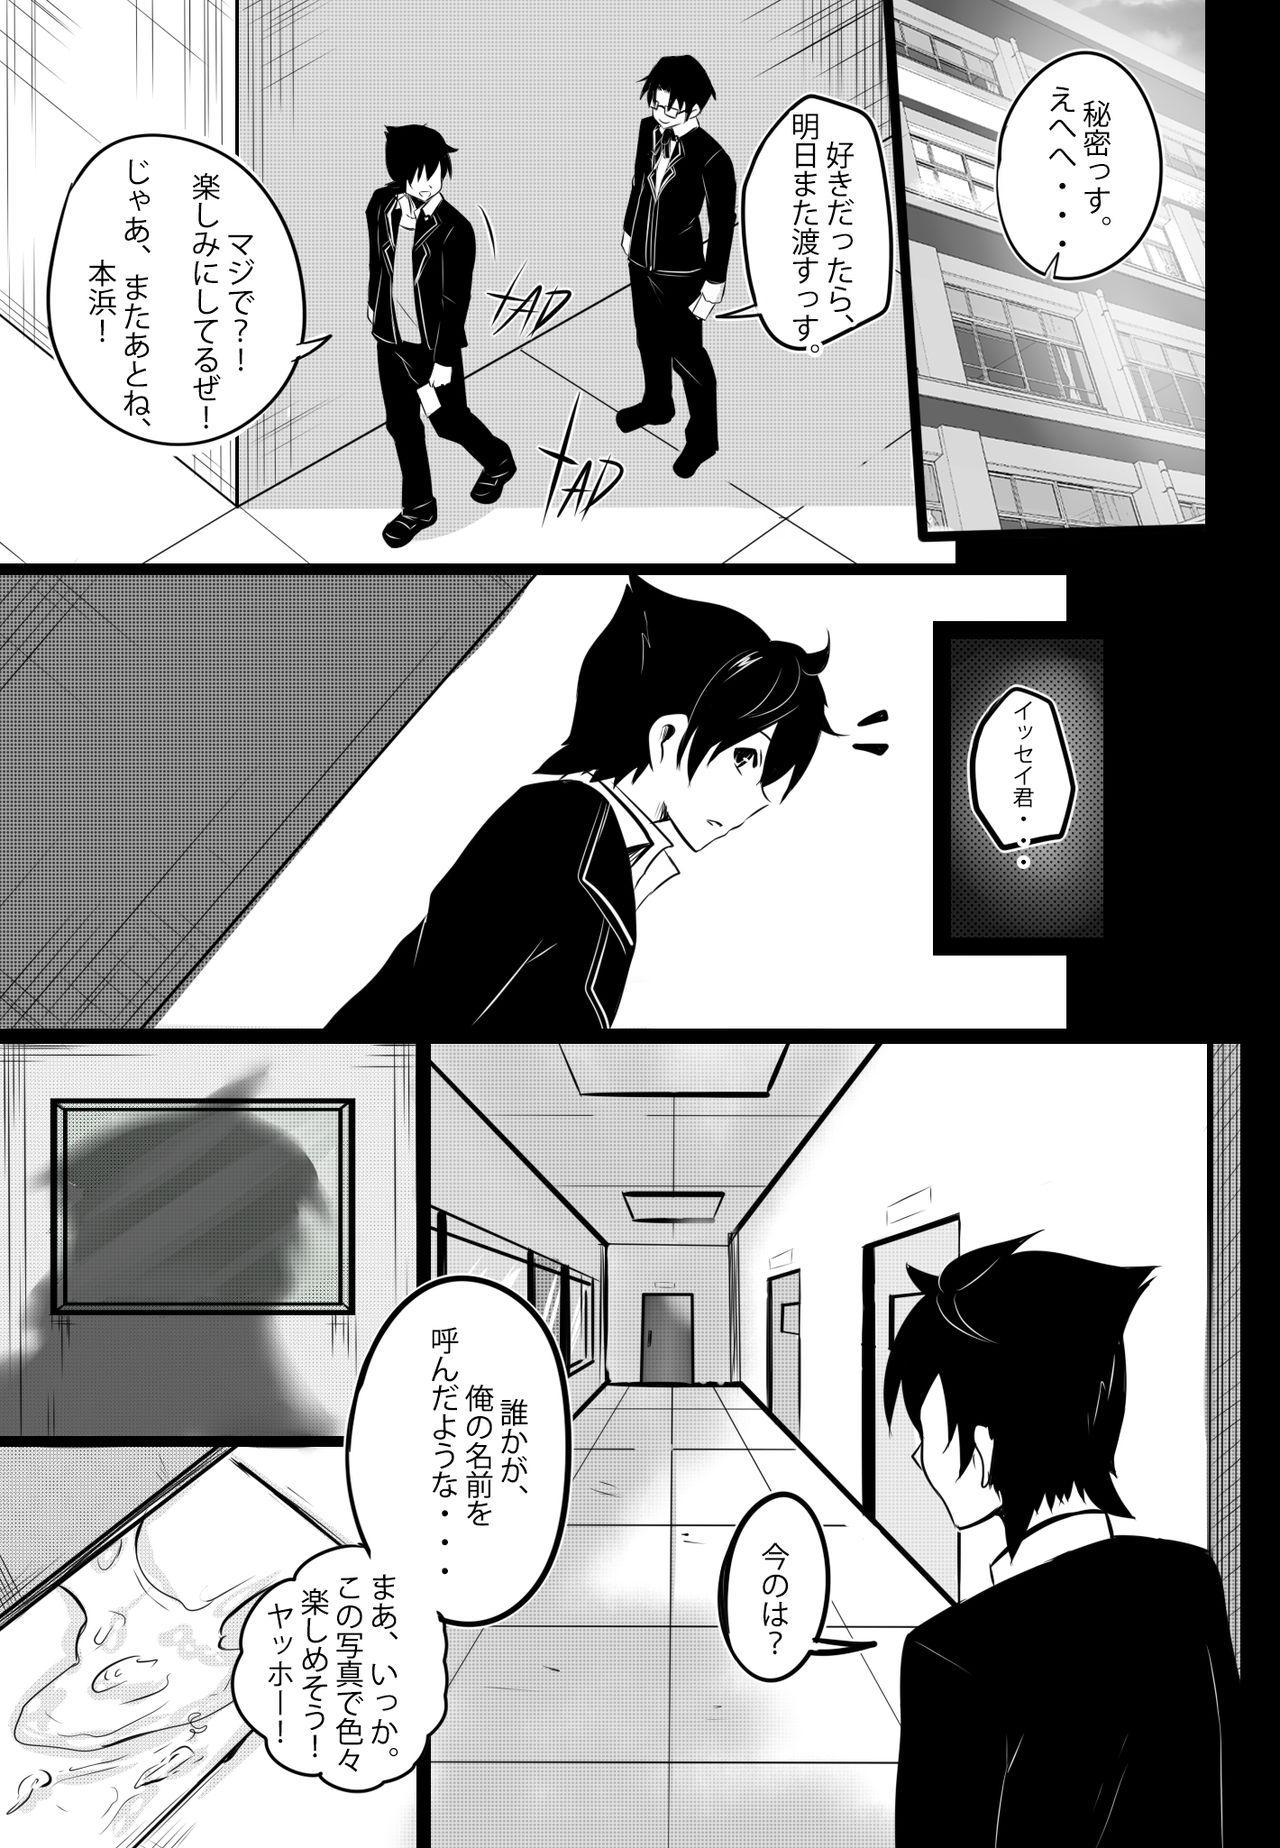 [Merkonig]B-Trayal 22-2 Akeno (Highschool DxD) 15